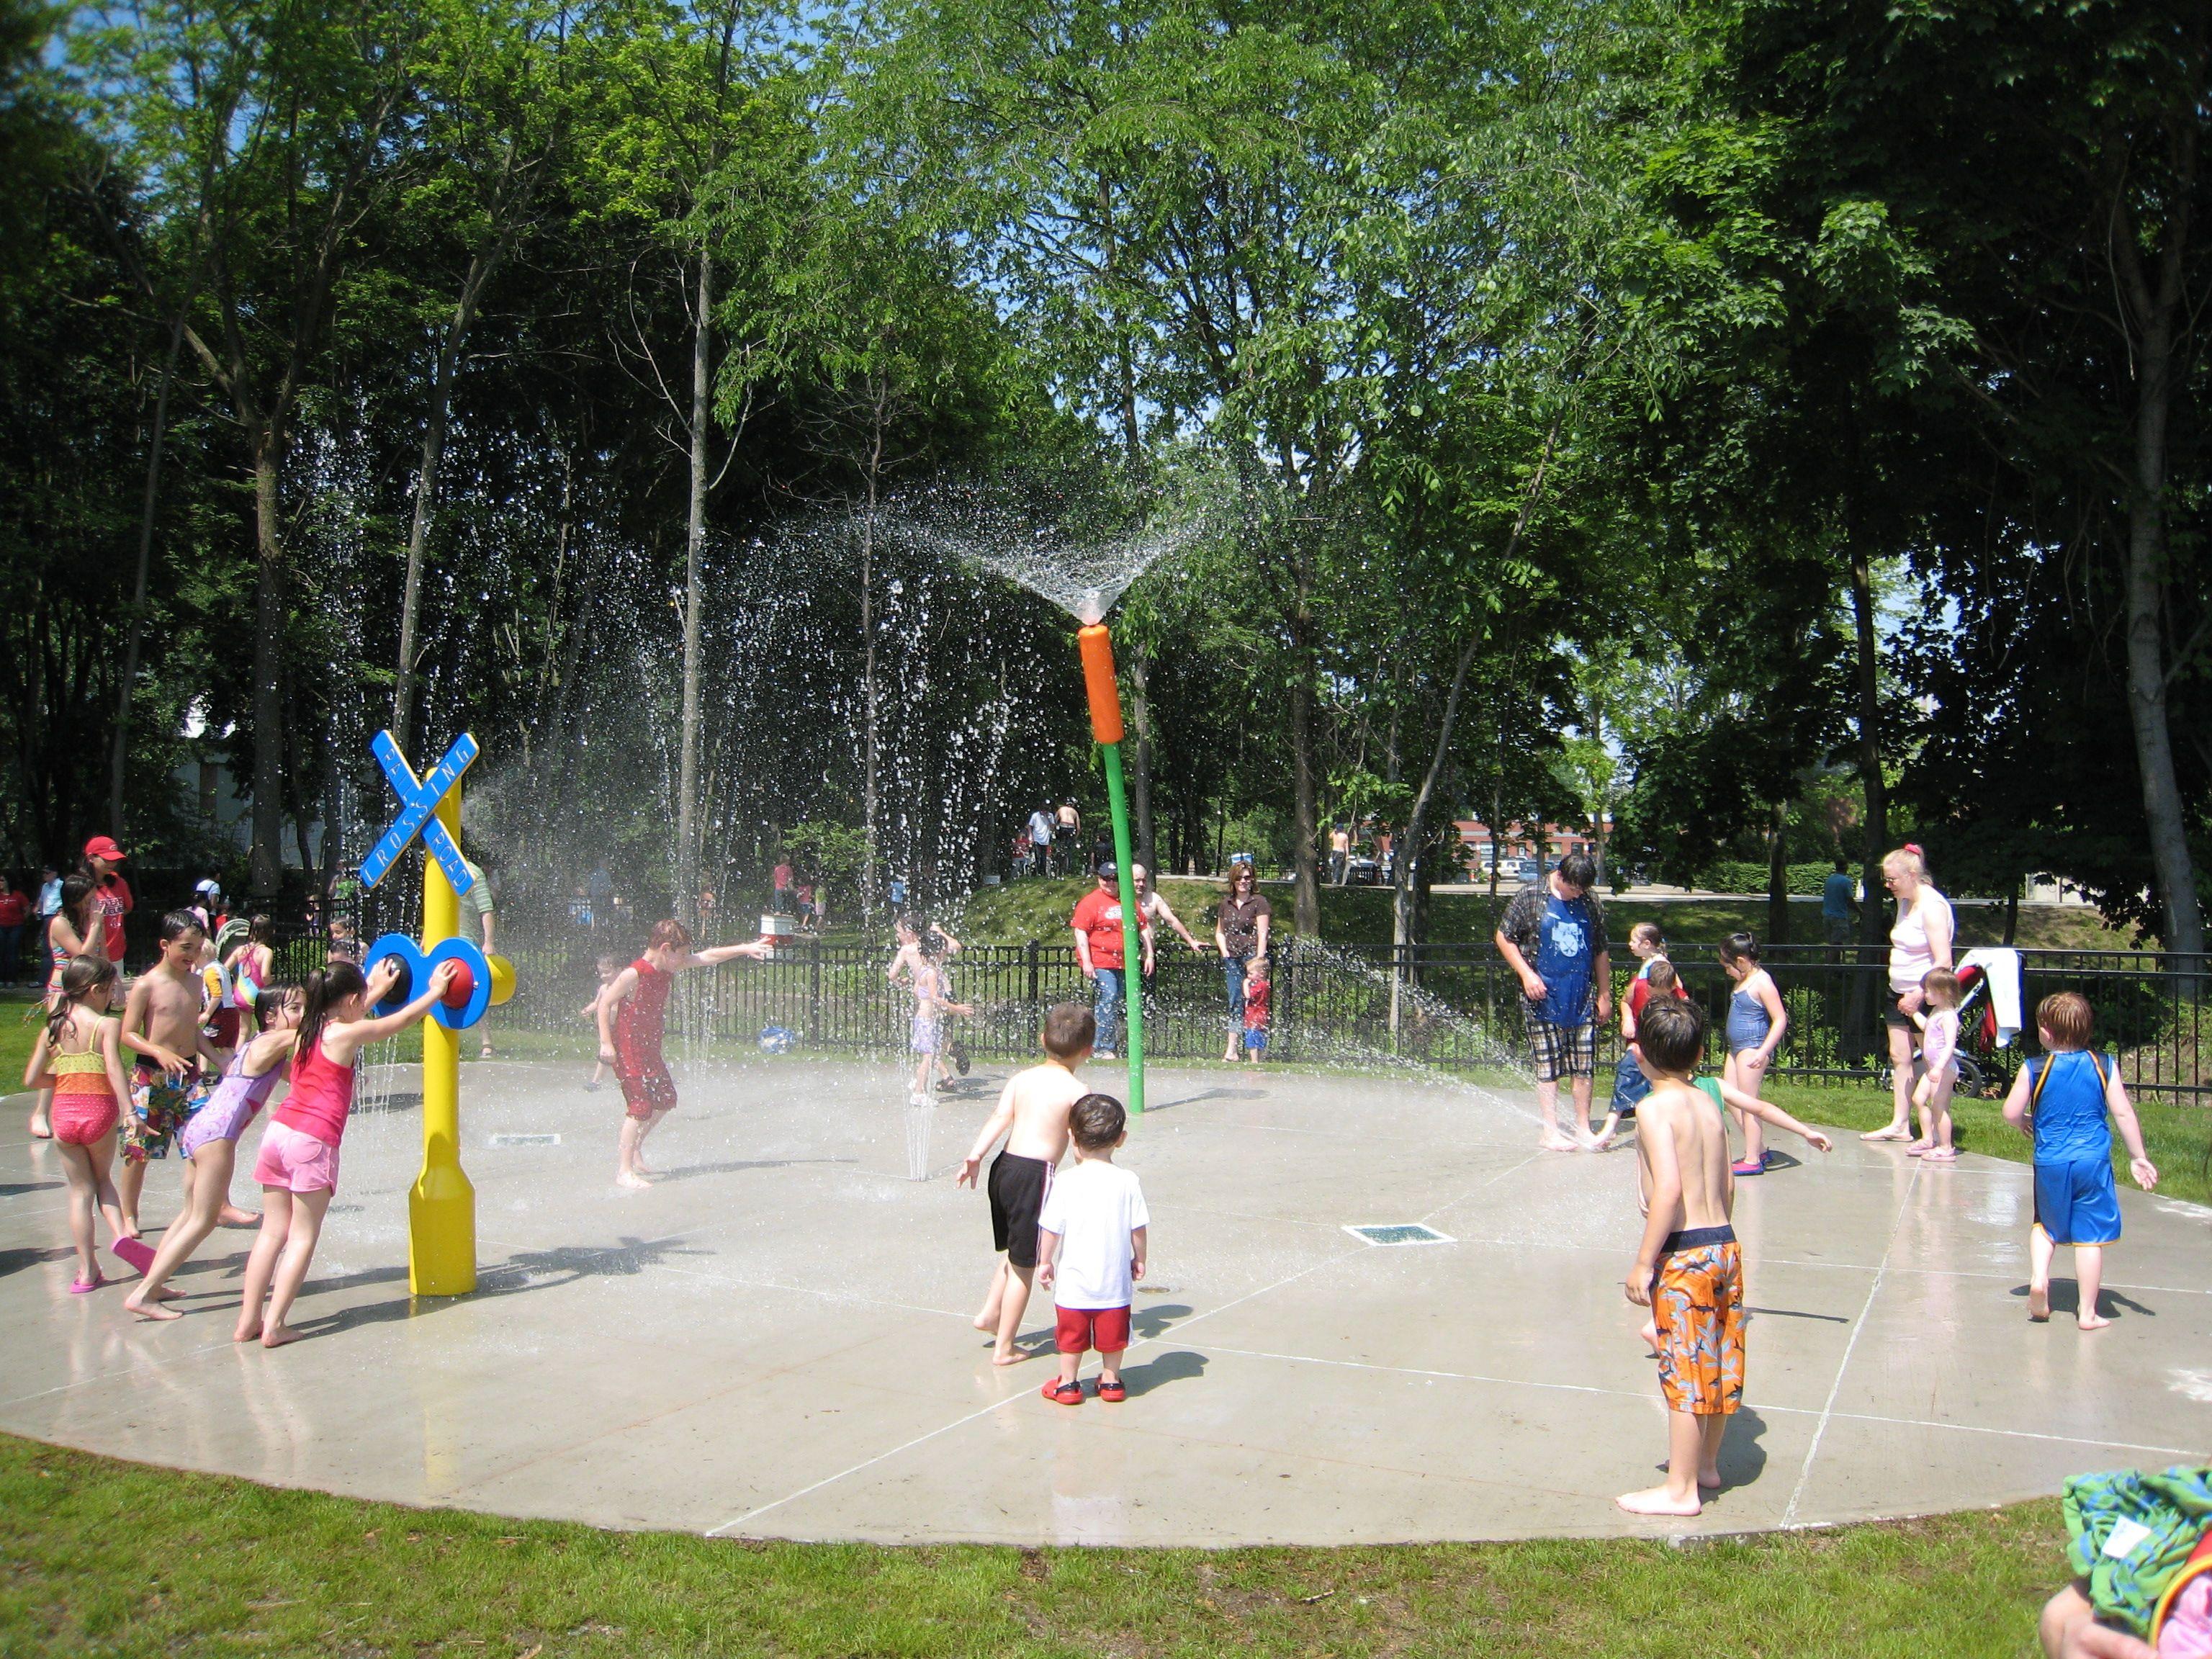 Town Of Hudson Ma Cellucci Skate Splash Park Splash Park Spray Park Water Park